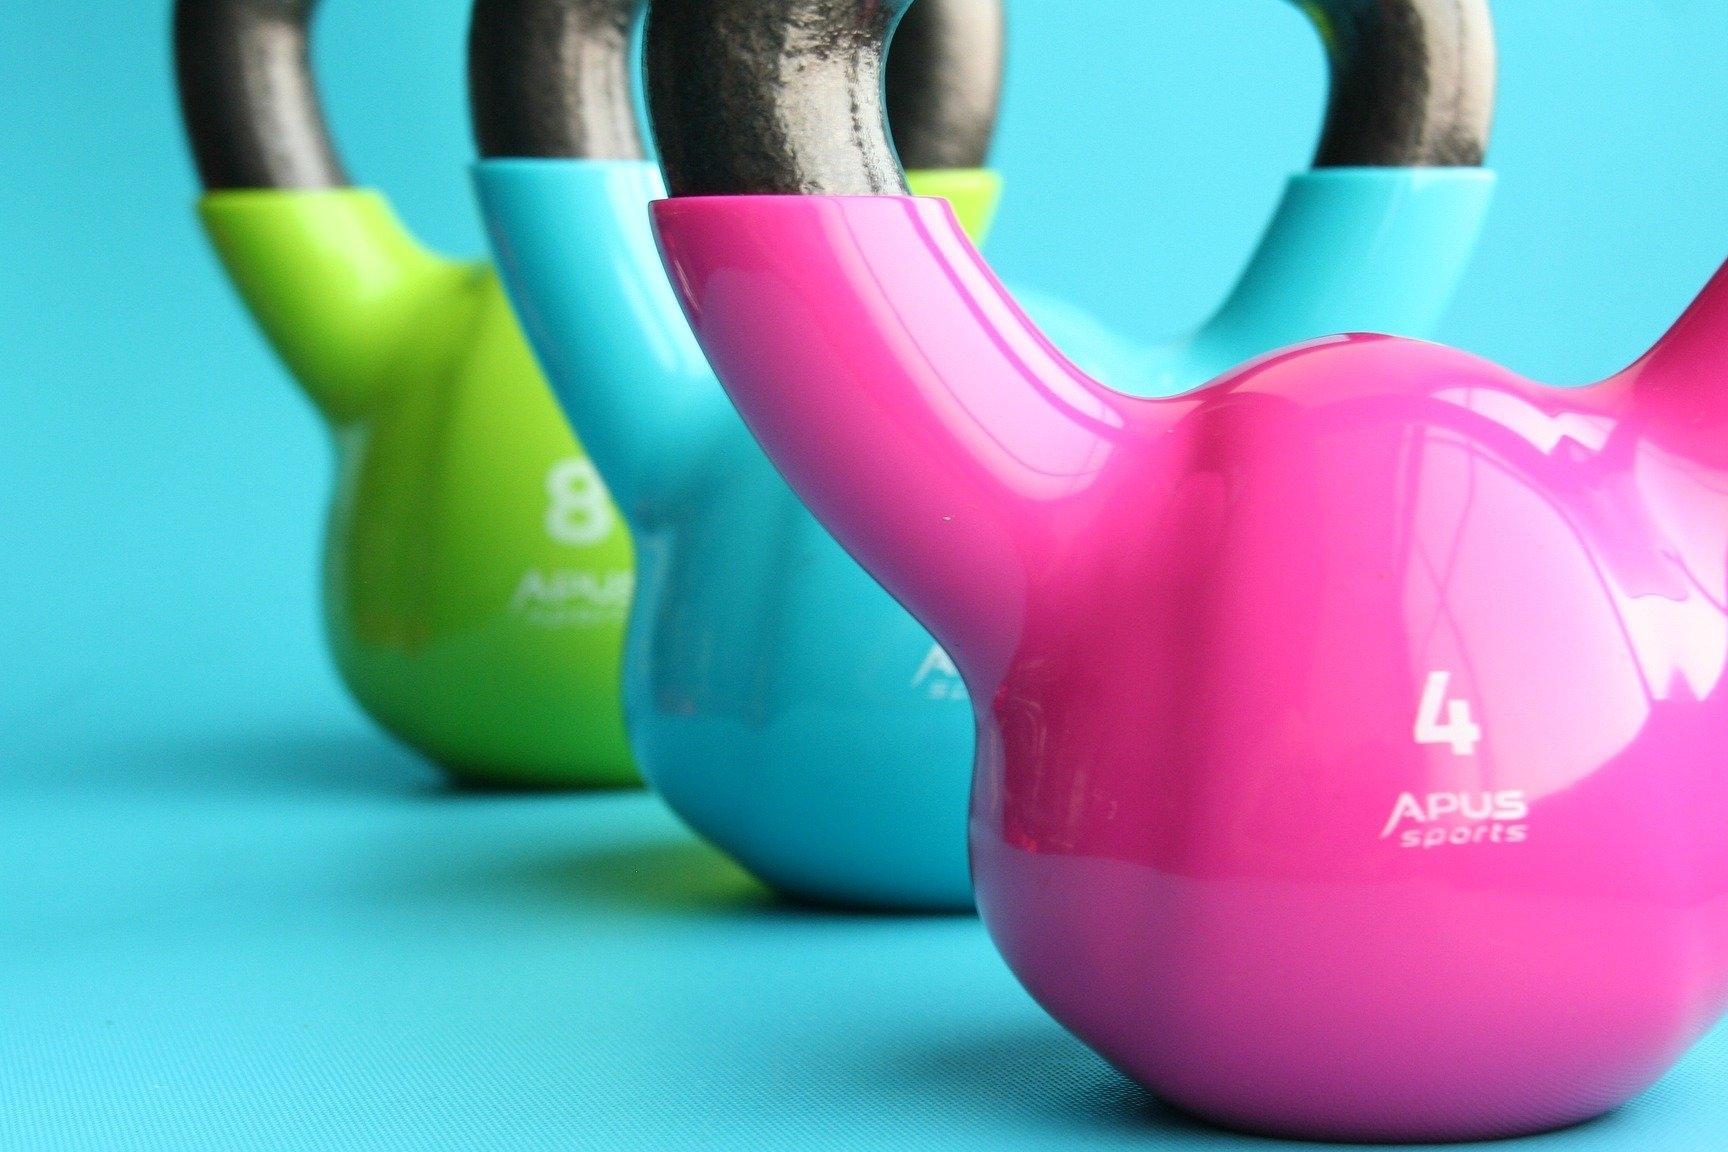 kracht, fitness en leefstijl